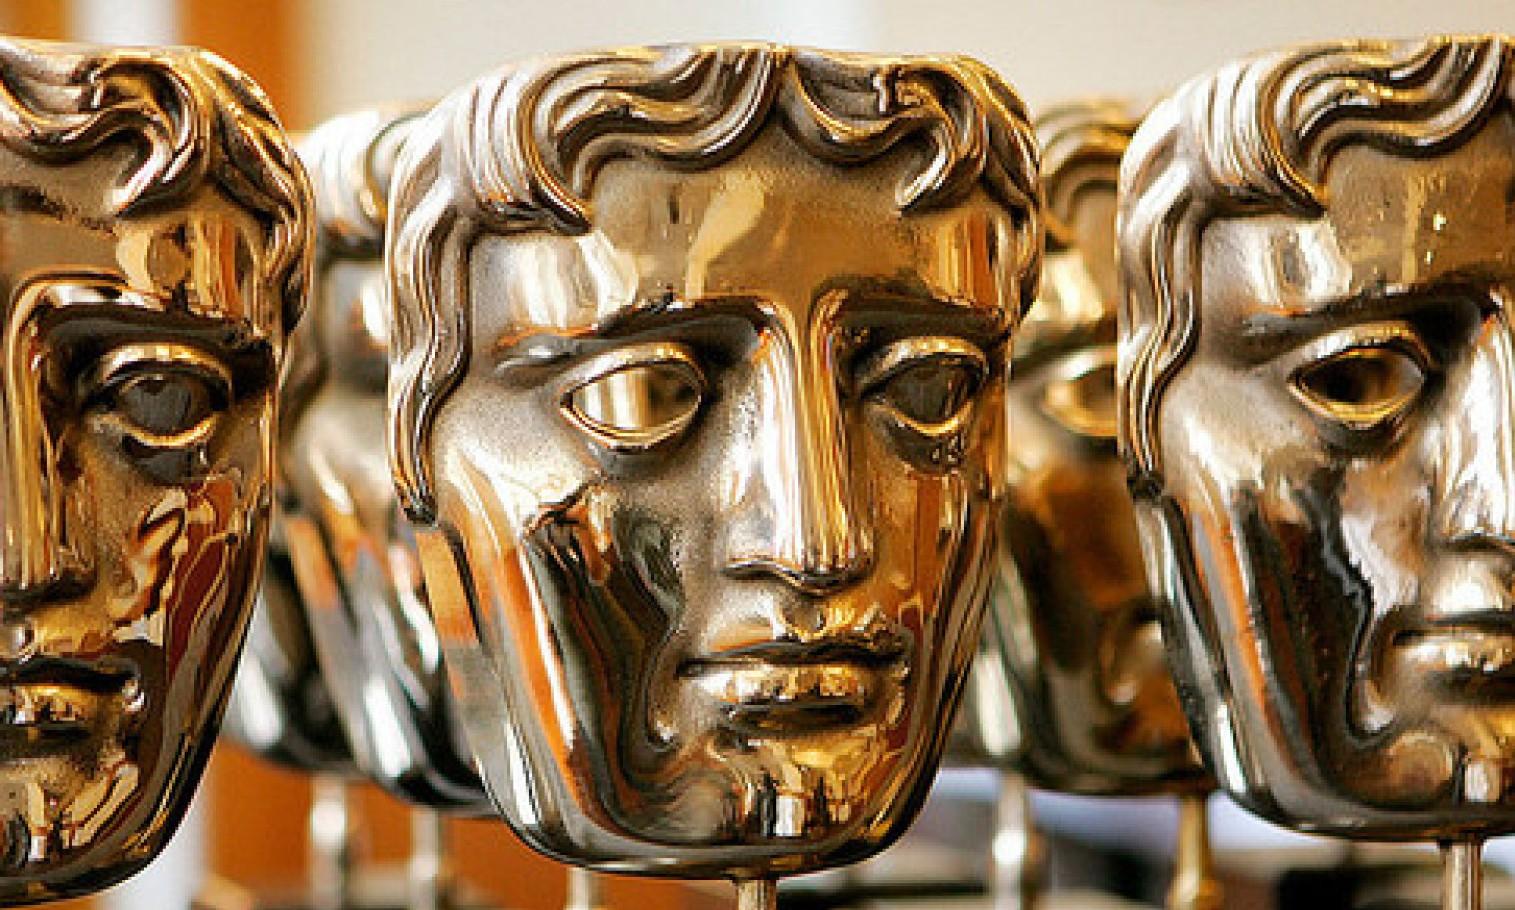 Bafta Awards: BAFTA Nominations For 2016 Are Announced